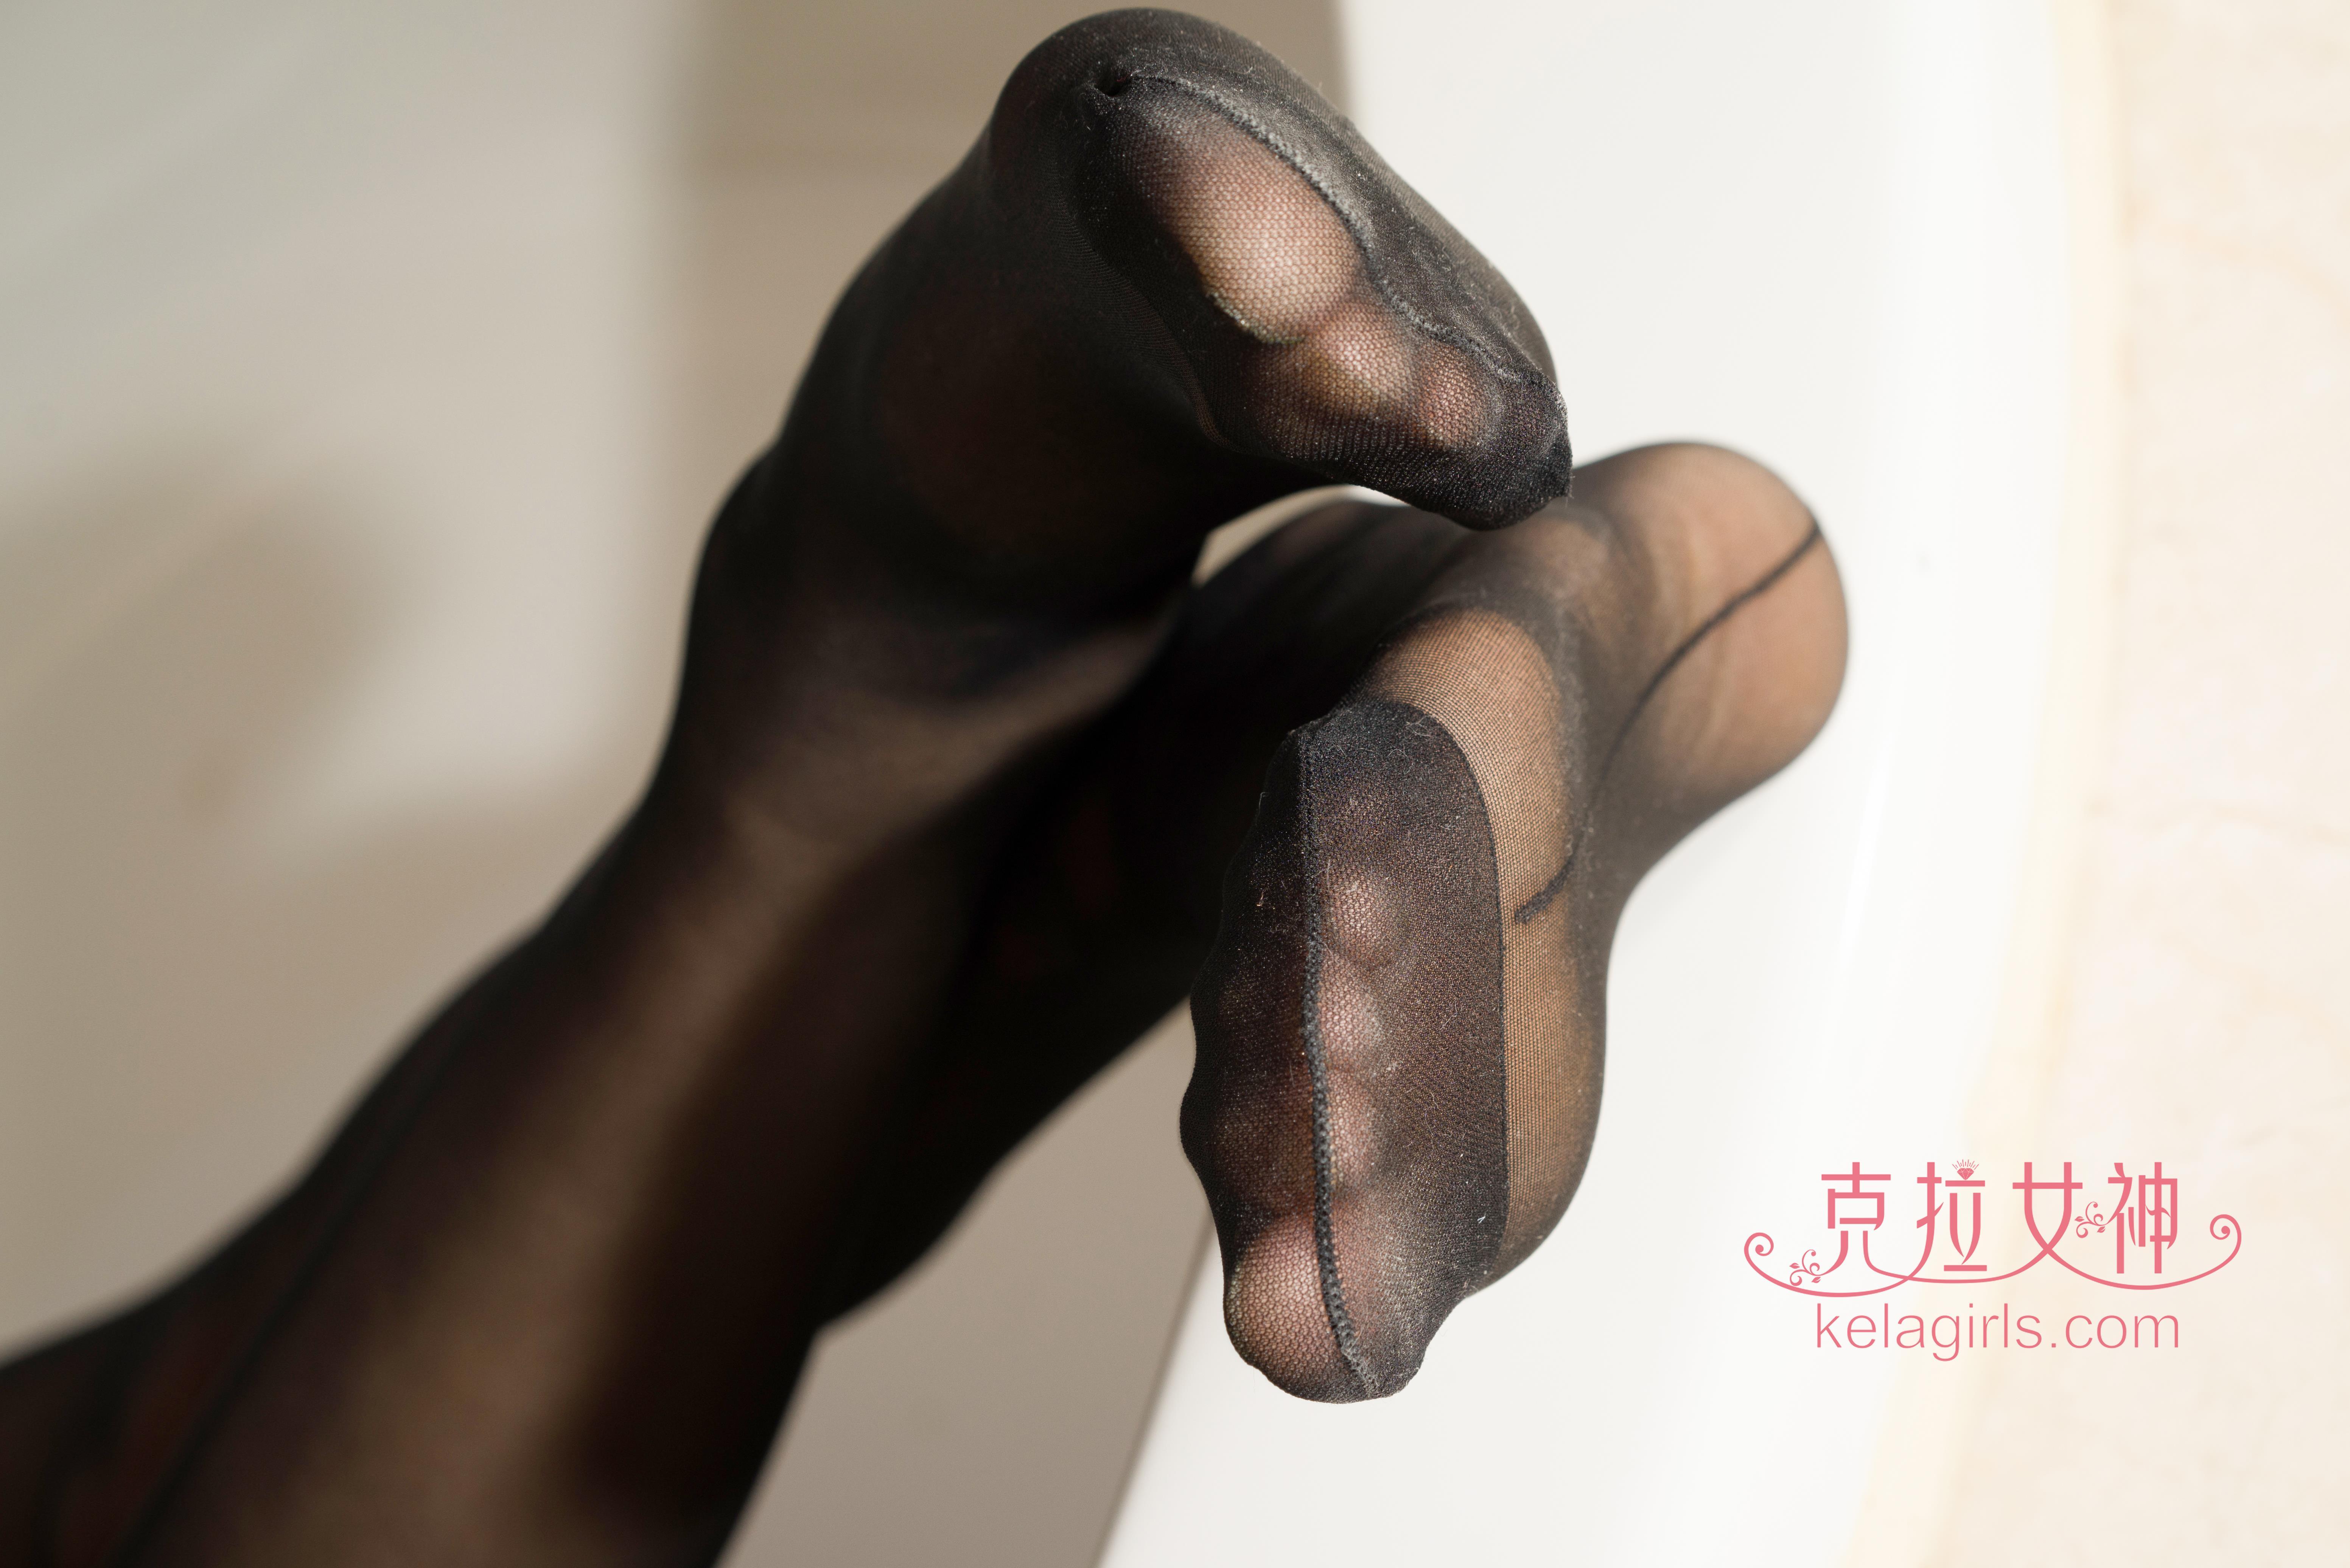 [kelagirls克拉女神]2018-04-06 《美丝美刻》 夏可木子 黑色性感内衣加黑色丝袜美腿玉足私房写真集